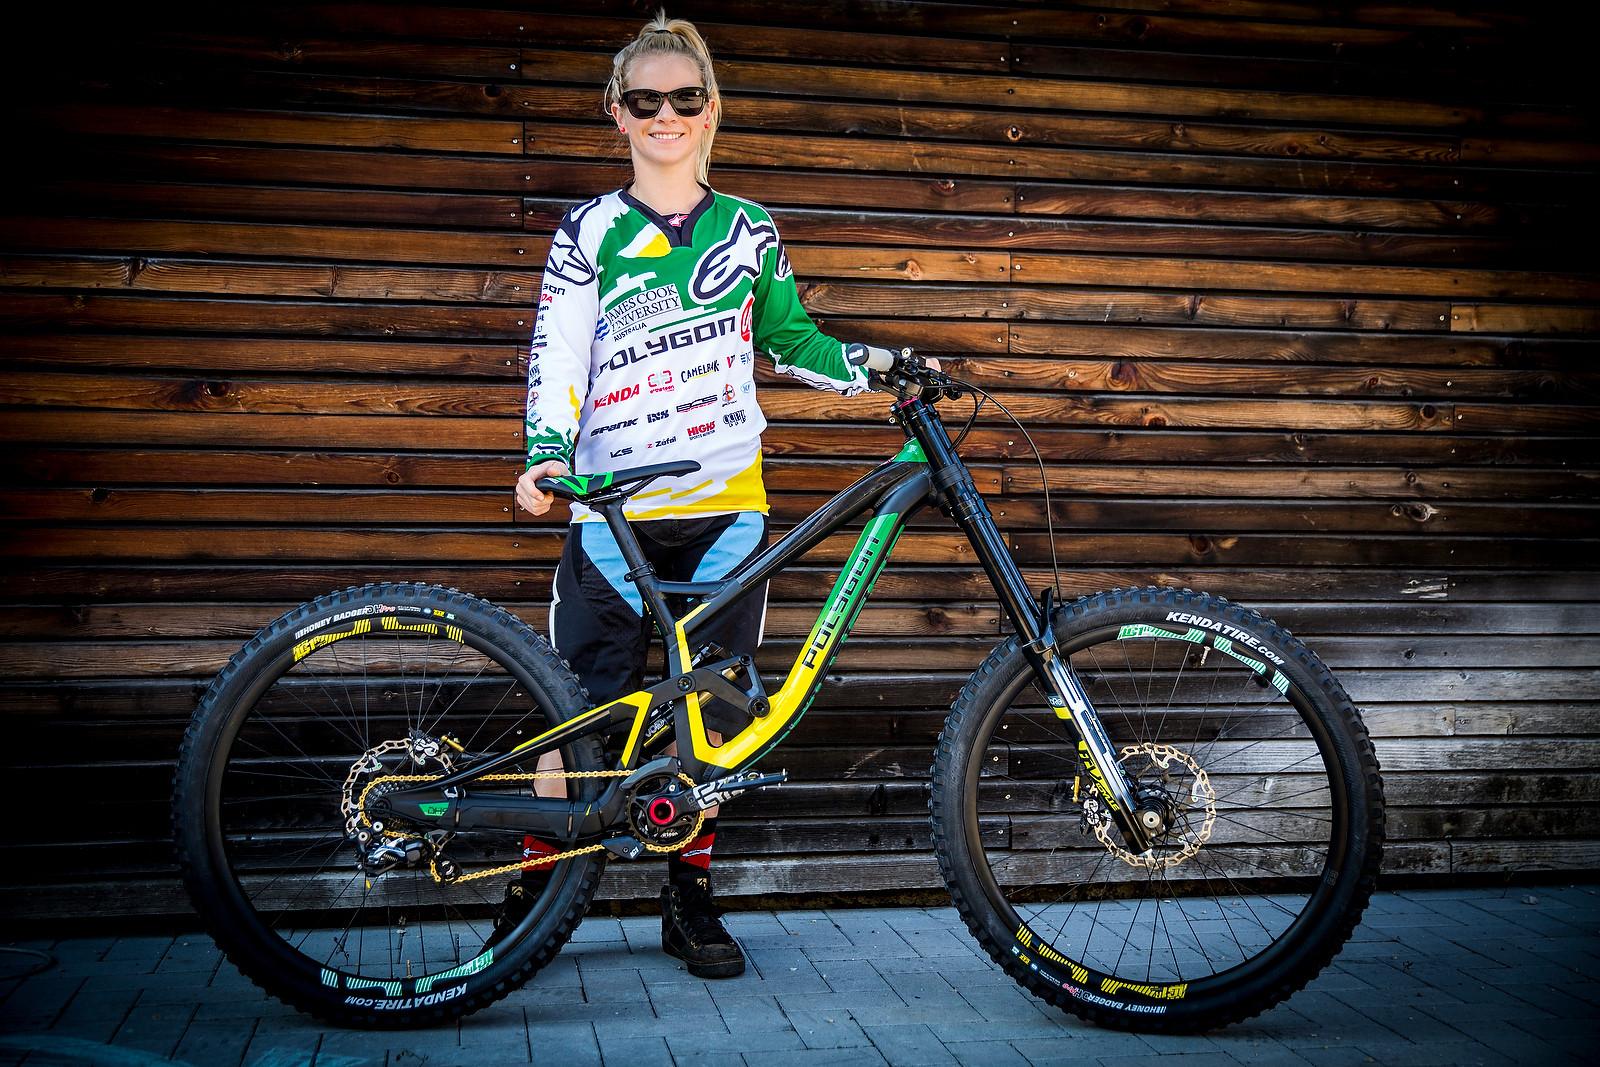 Tracey Hannah's Polygon DH | 2016 World Champs Bike - PIT BITS & BIKES - 2016 World Champs - Mountain Biking Pictures - Vital MTB